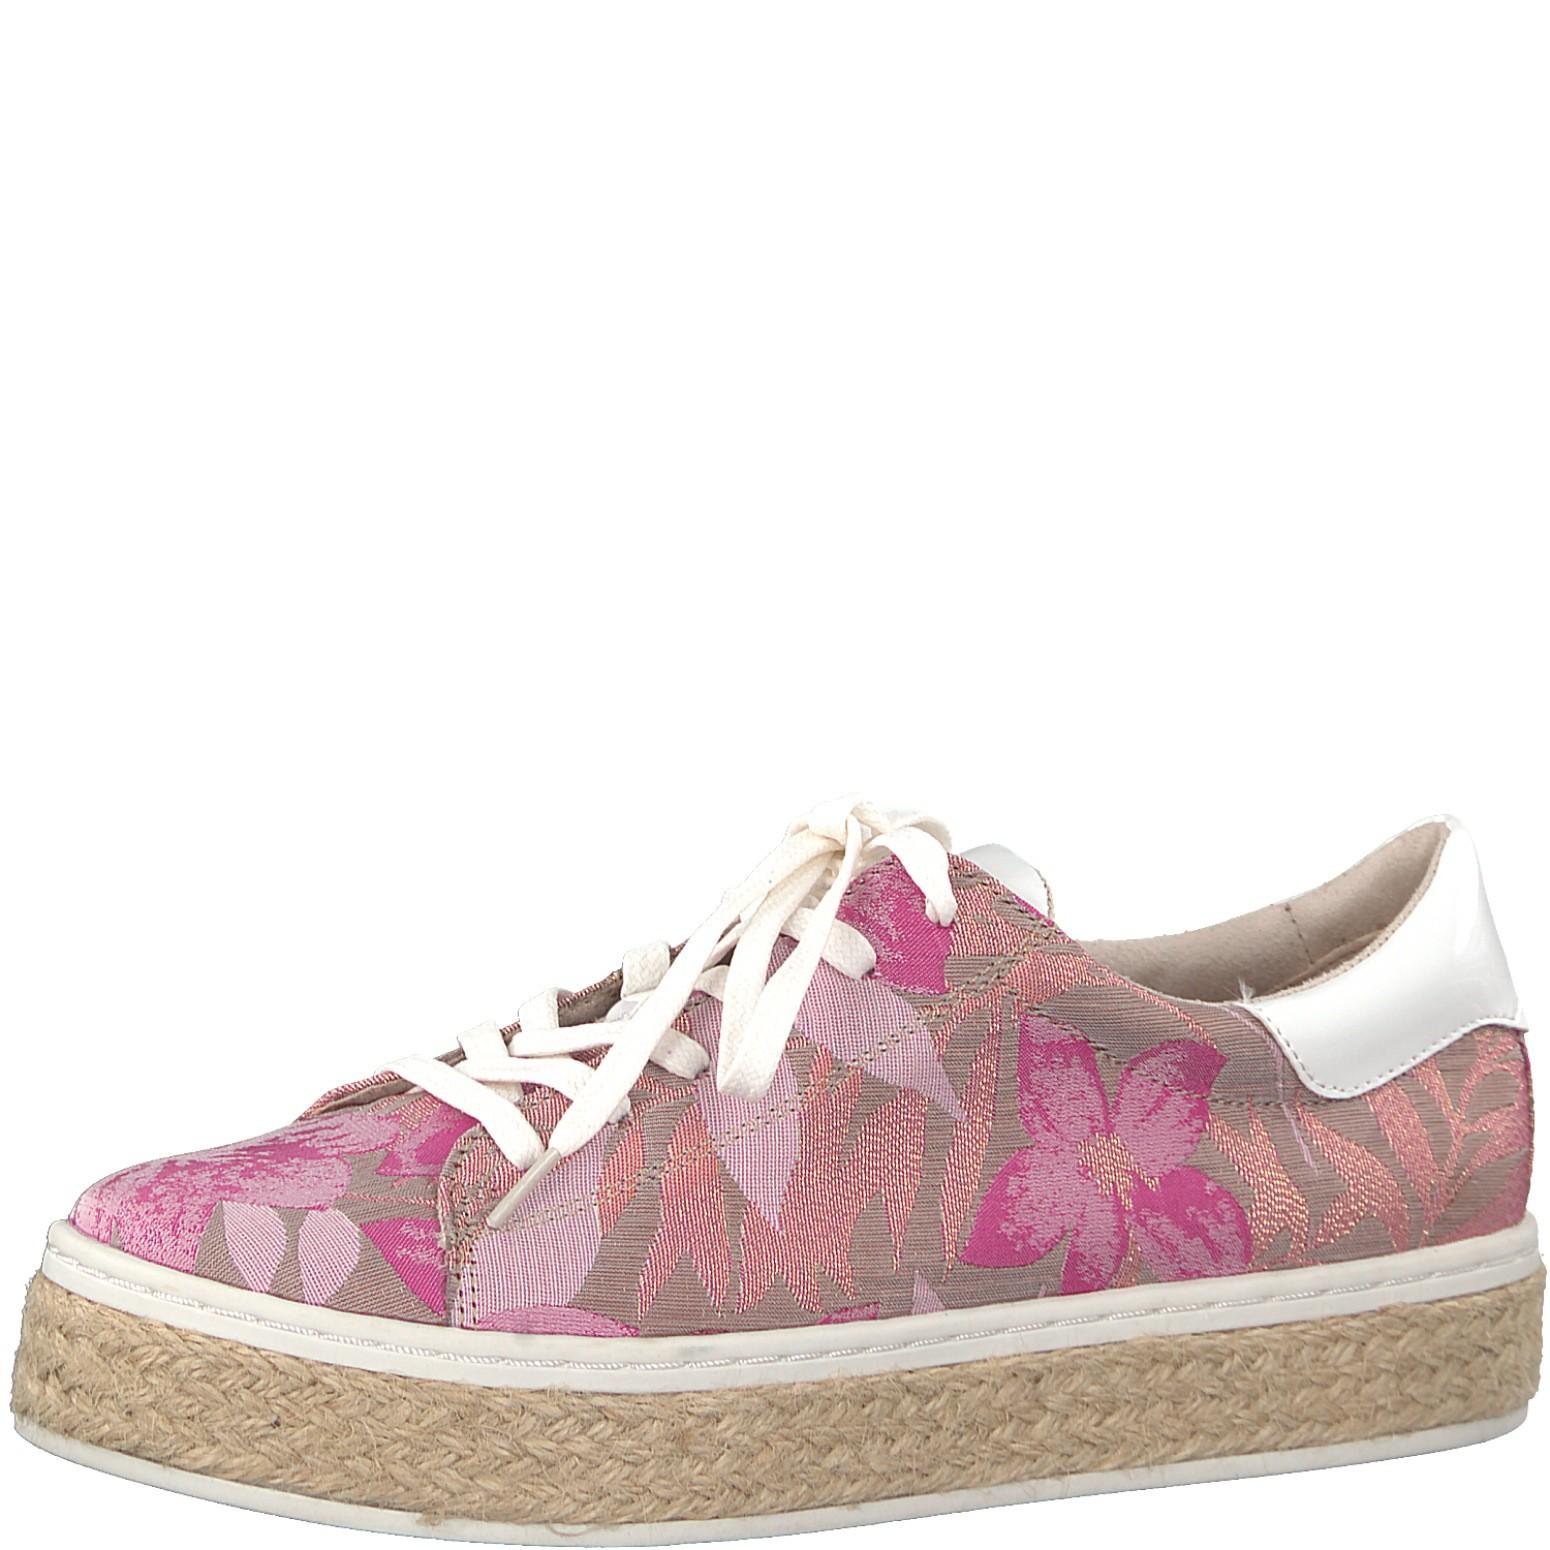 Xarashoes Pantofi femei S.Oliver 5-5-23654-20 589 Rose Multi 1